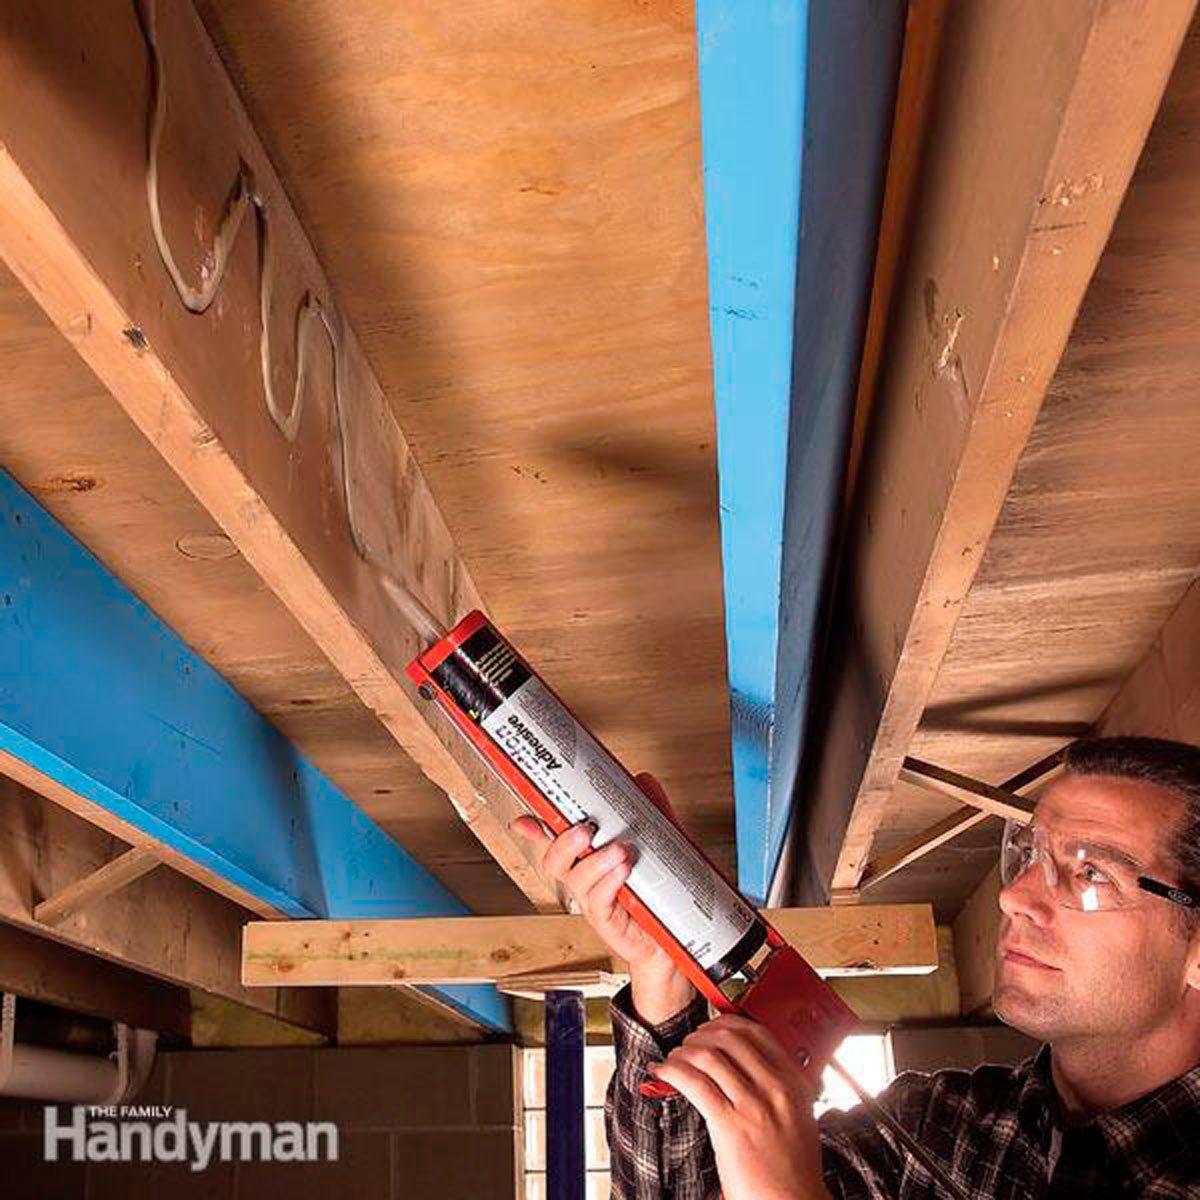 How To Make Structural Repairs By Sistering Floor Joists Home Repair Home Repairs Diy Home Improvement